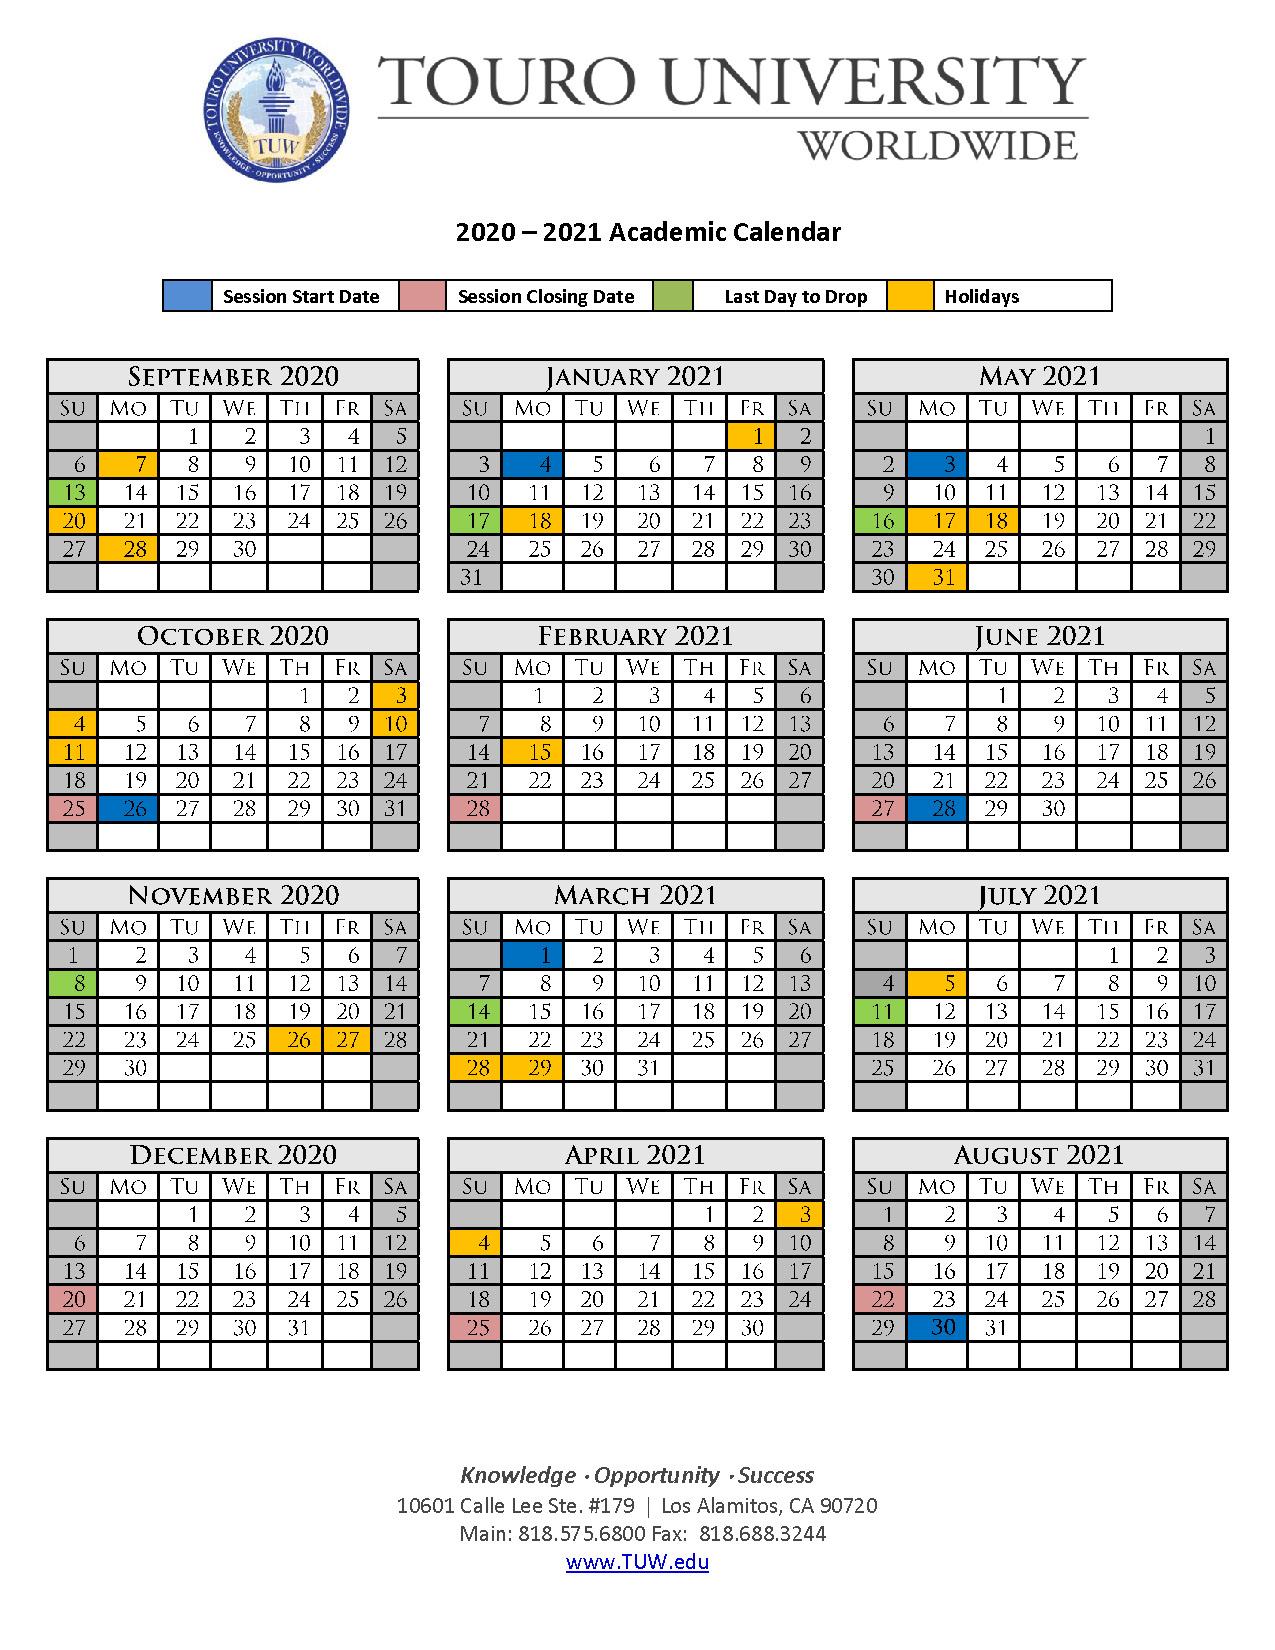 Academic Calendar | Touro University Worldwide Pertaining To Santa Clara University Calendar 2020 2021